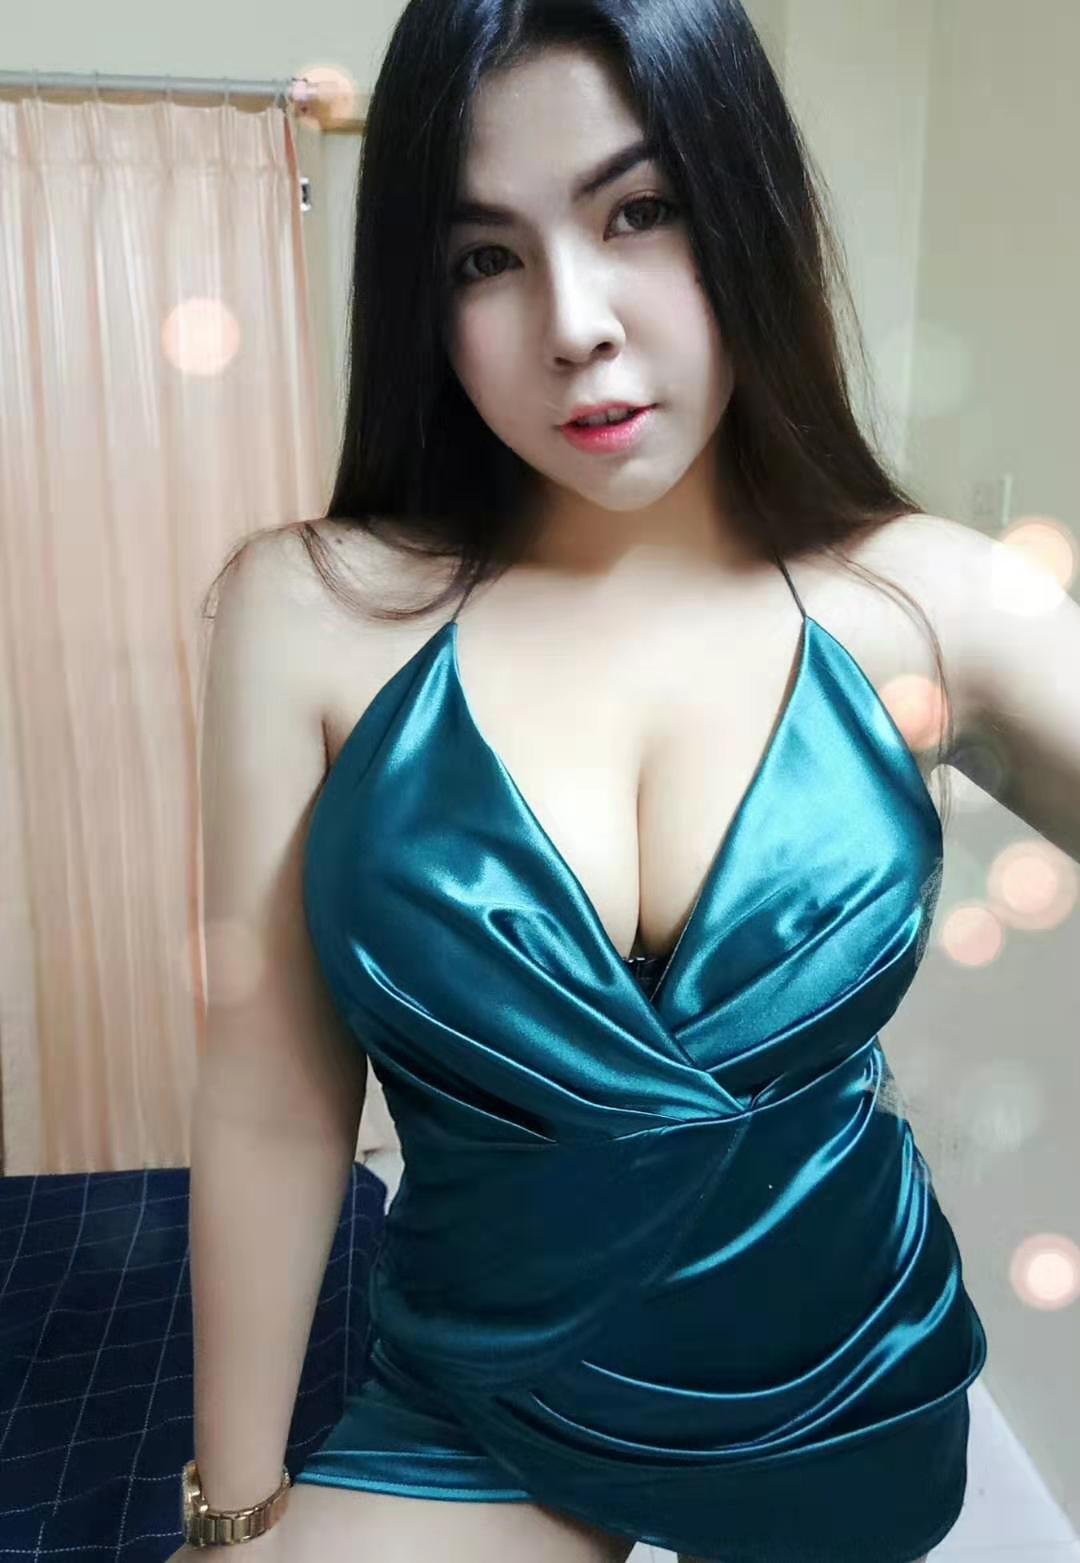 Nana hot Thai girl, Thai escort in Dubai